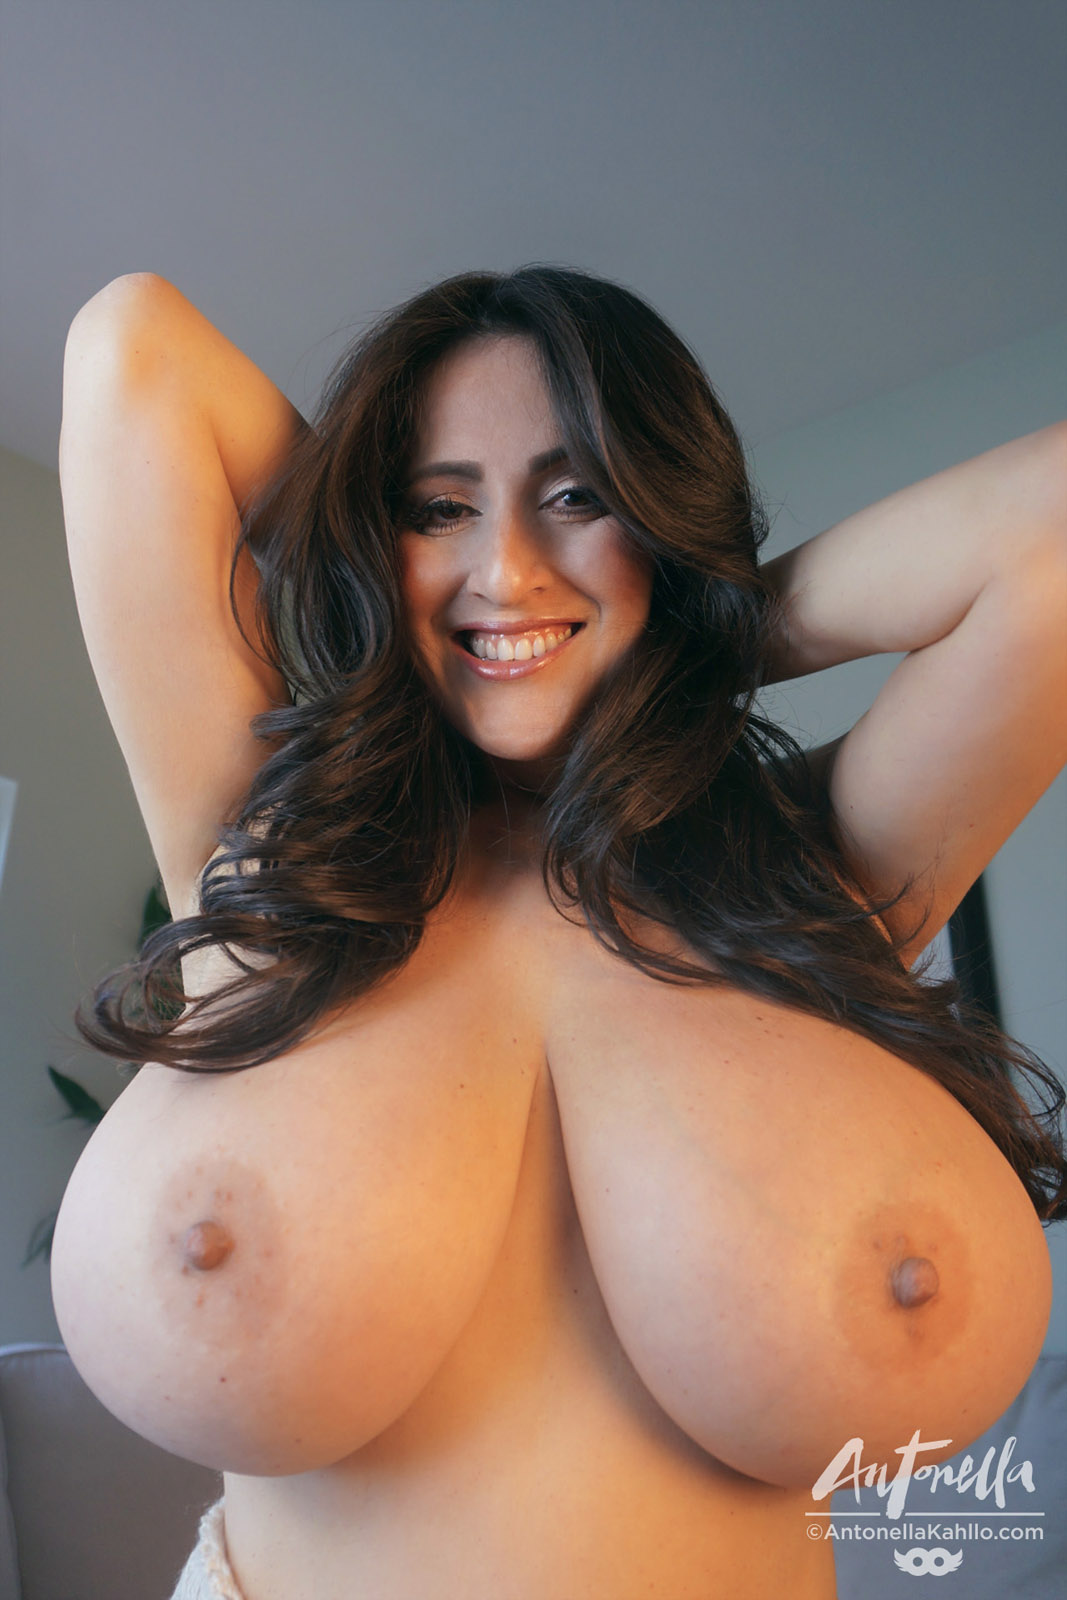 Antonella Kahtlo Porn antonella kahllo mesh goddess   free hot nude porn pic gallery